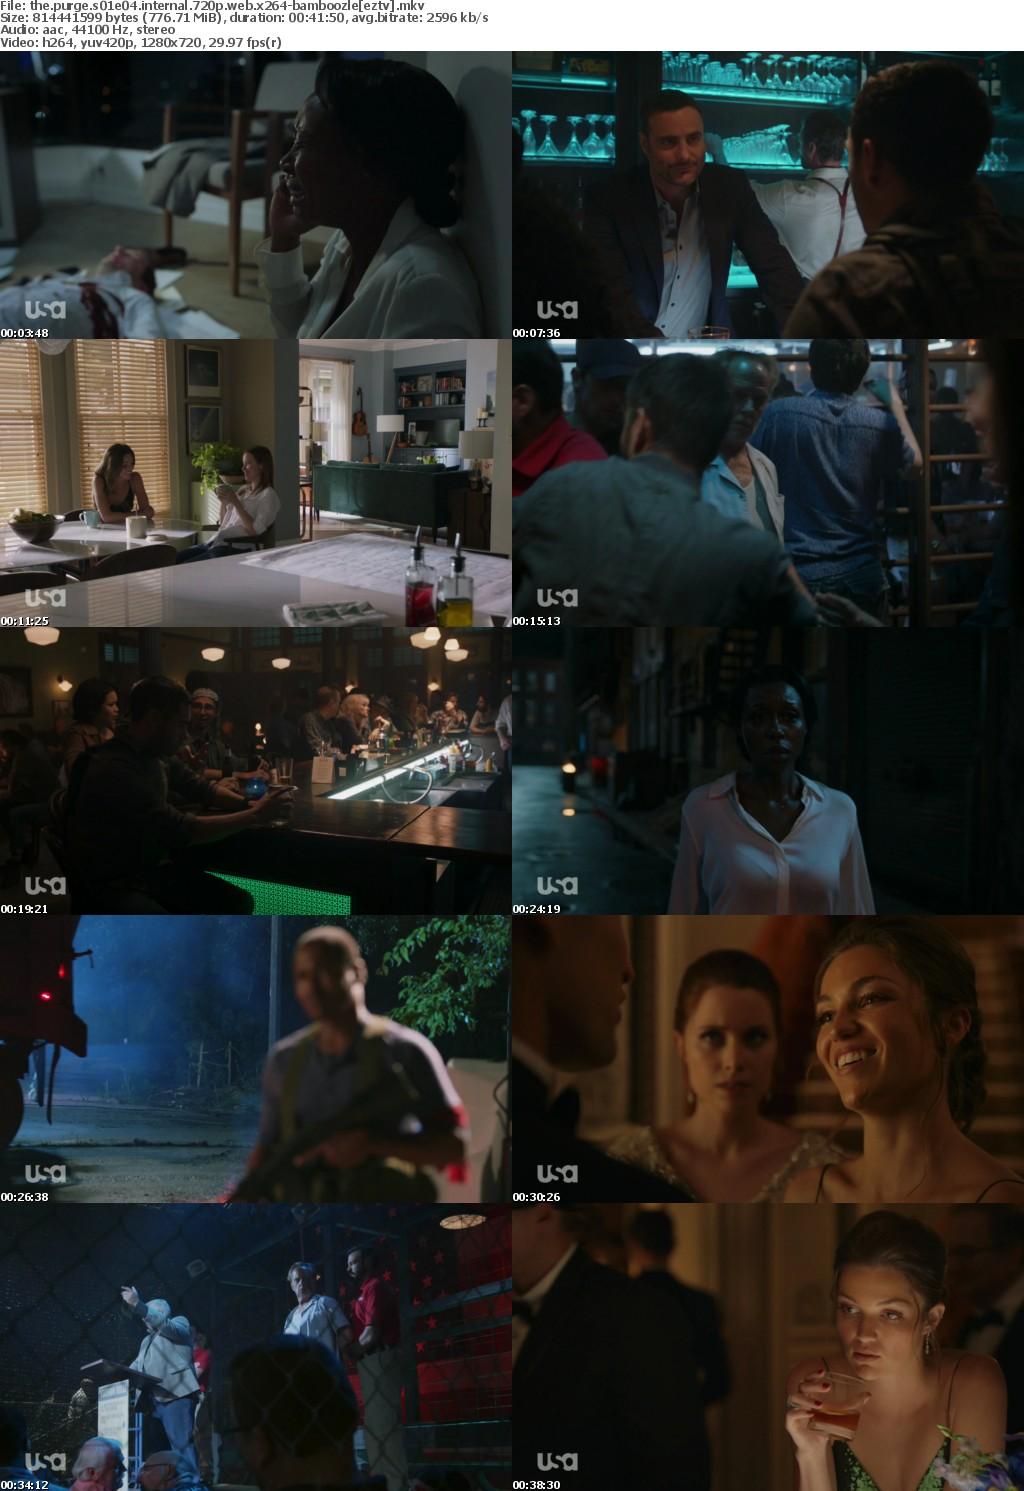 The Purge S01E04 iNTERNAL 720p WEB x264-BAMBOOZLE